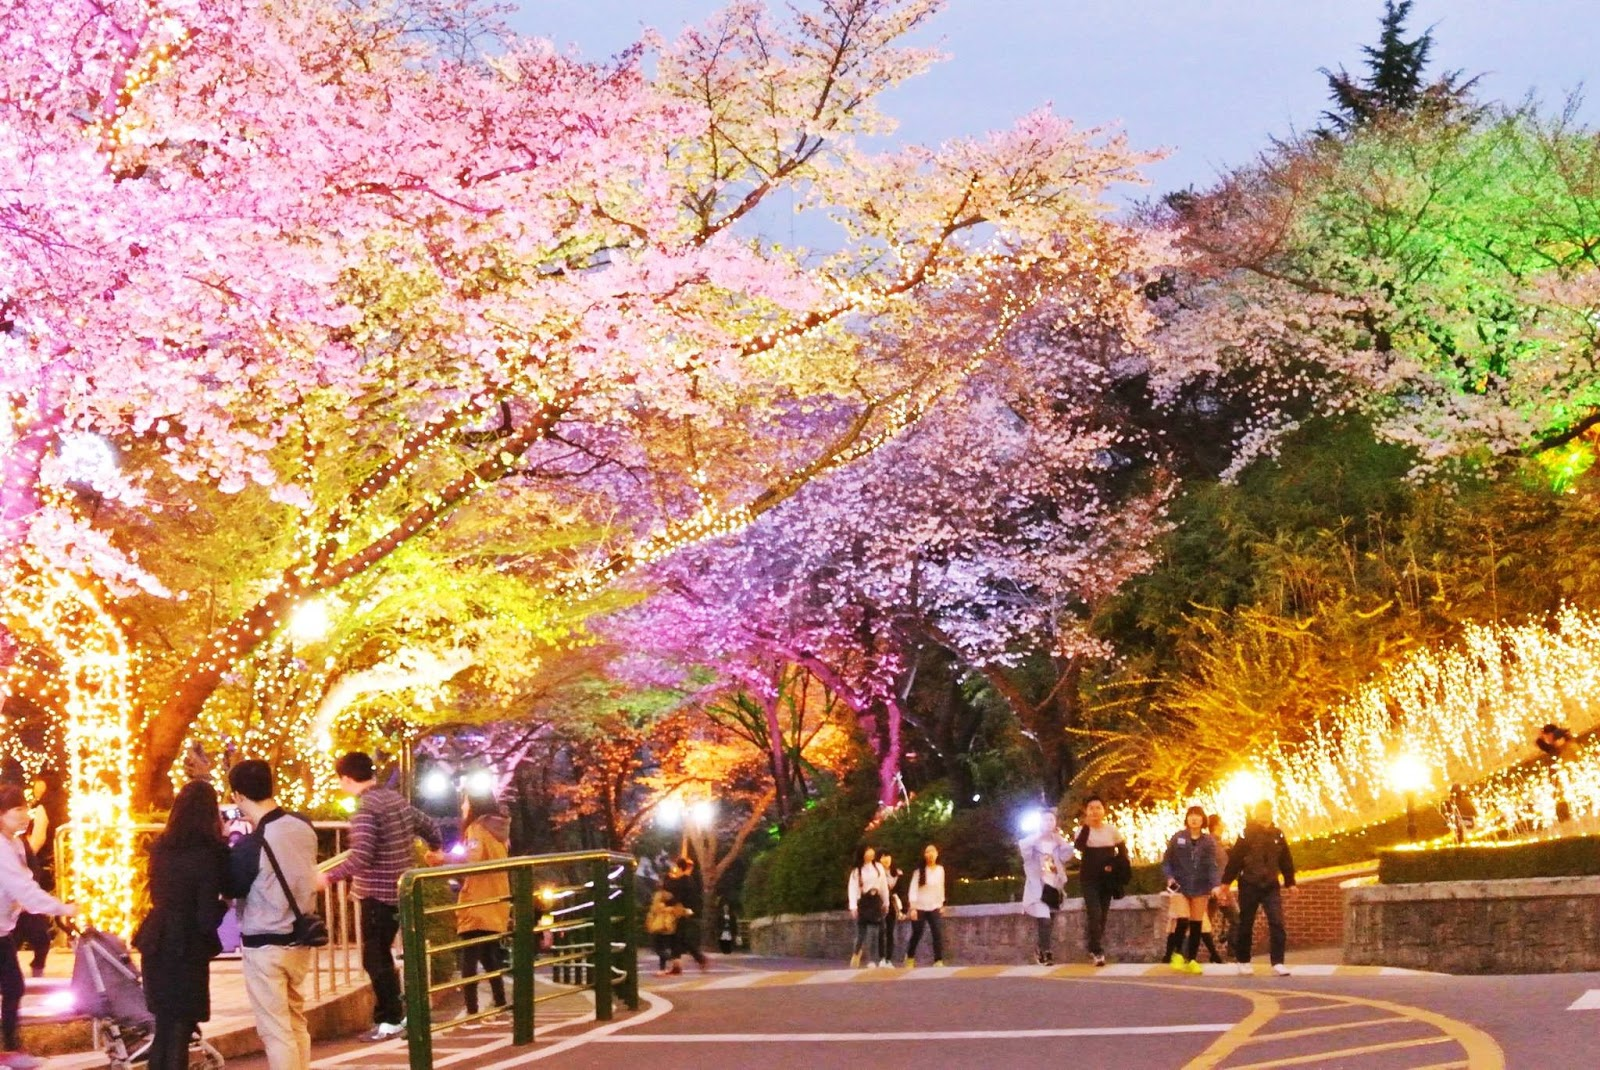 Wisata di Korea Selatan - Namsan Park Malam Hari (myeongdong)